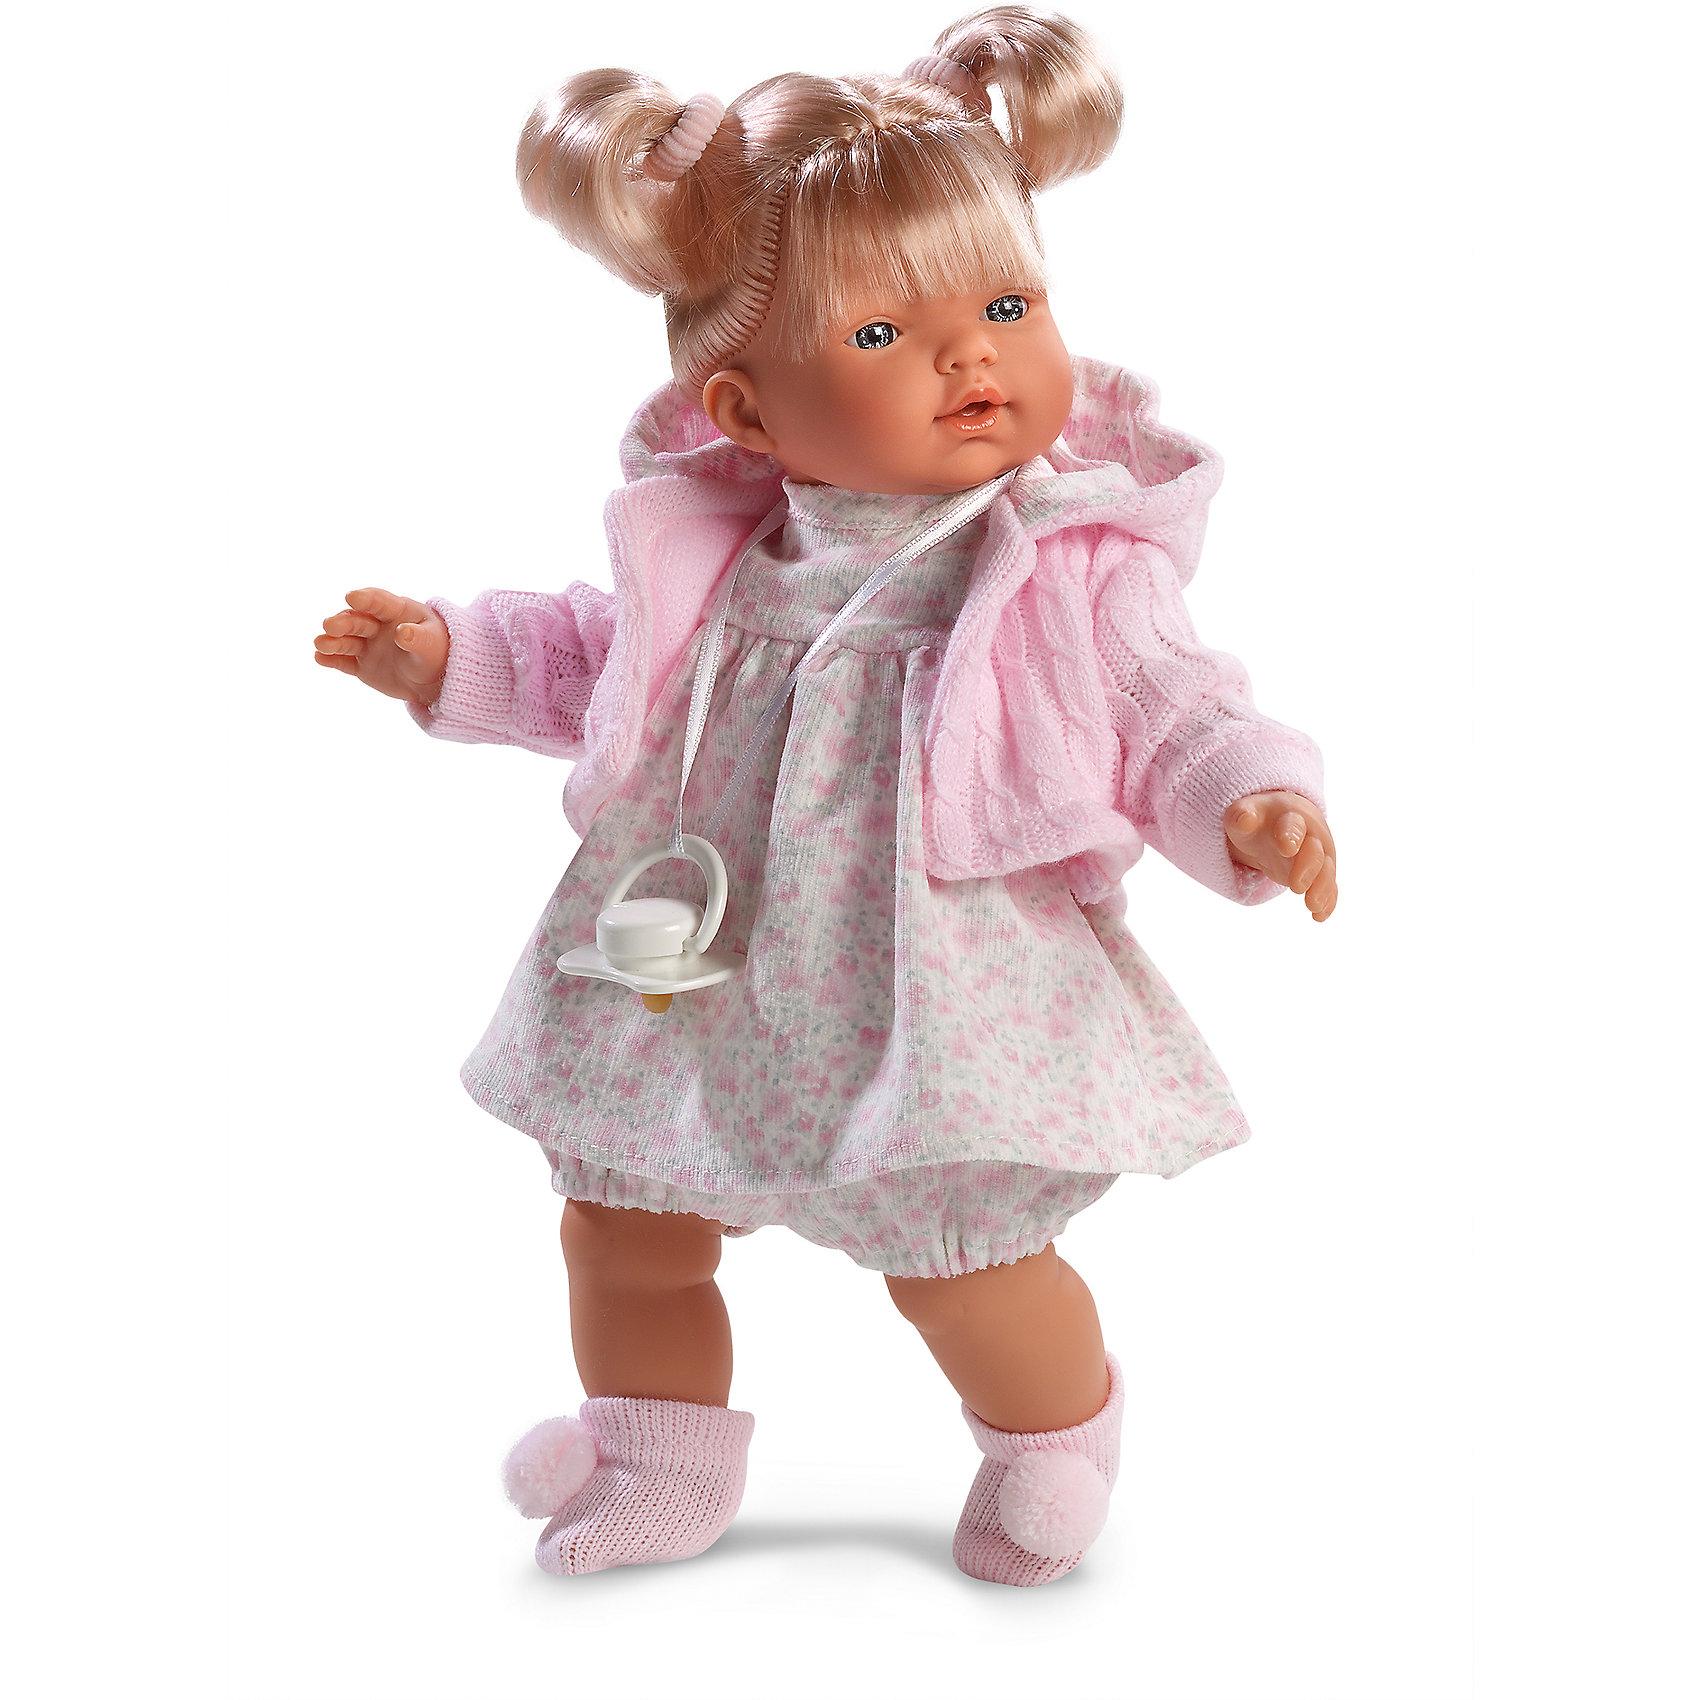 Llorens Кукла Хейди, 33 см, Llorens куклы и одежда для кукол llorens кукла изабела 33 см со звуком